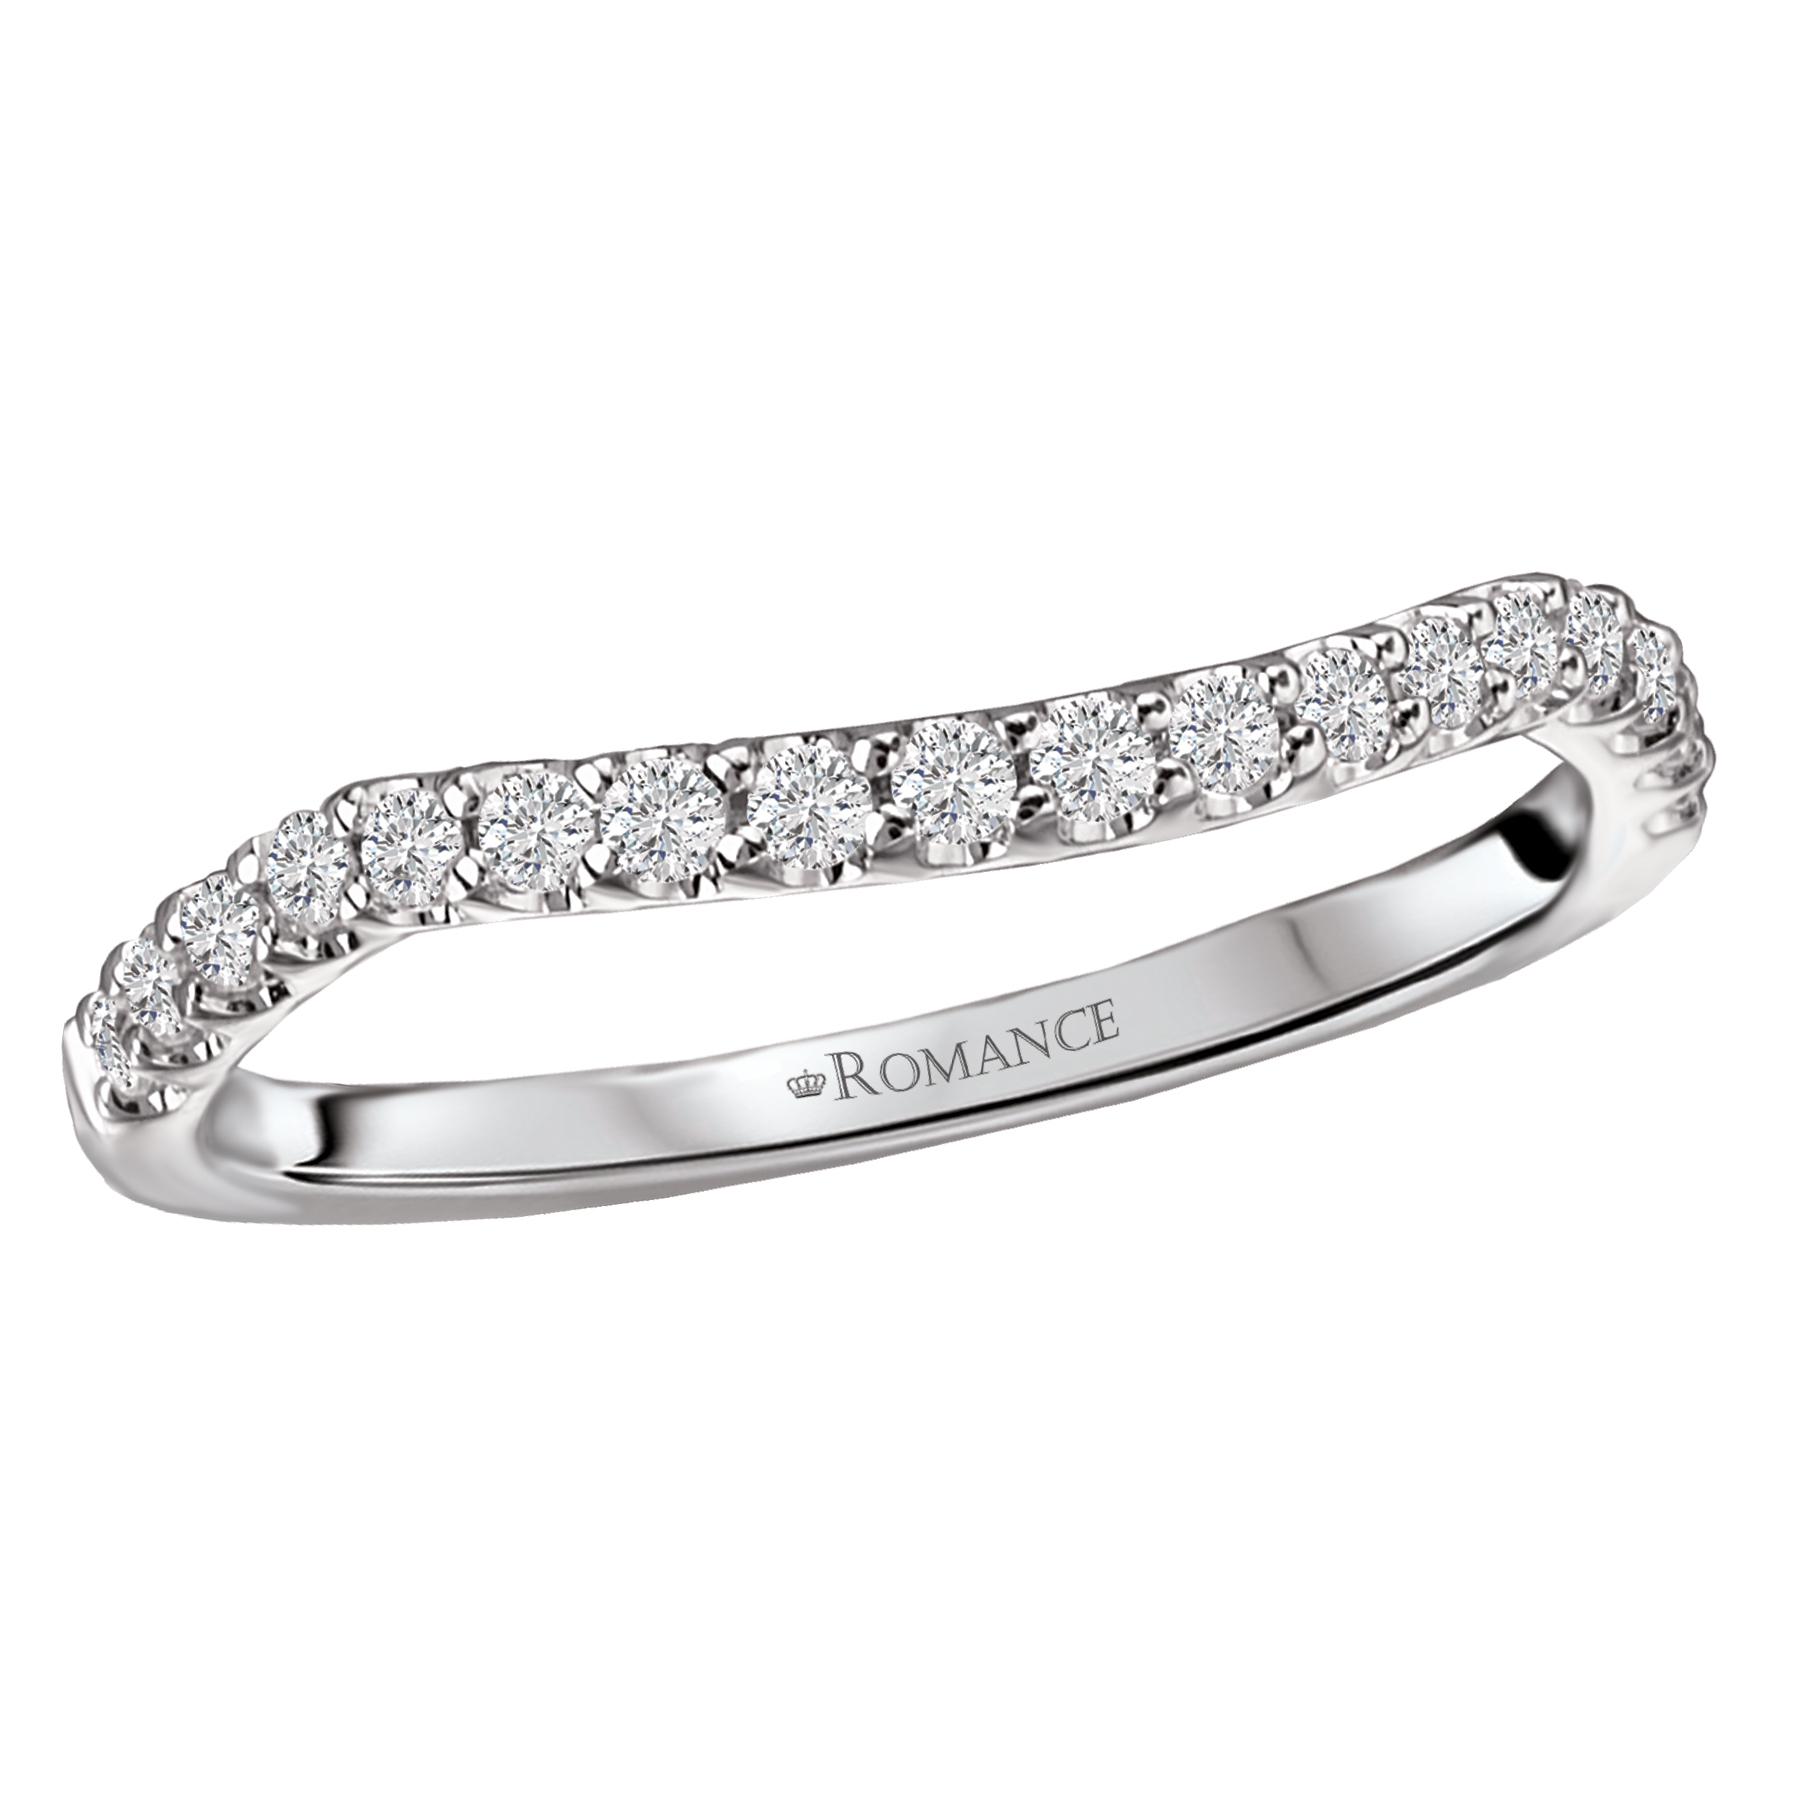 Romance Wedding Bands 117667-100W product image